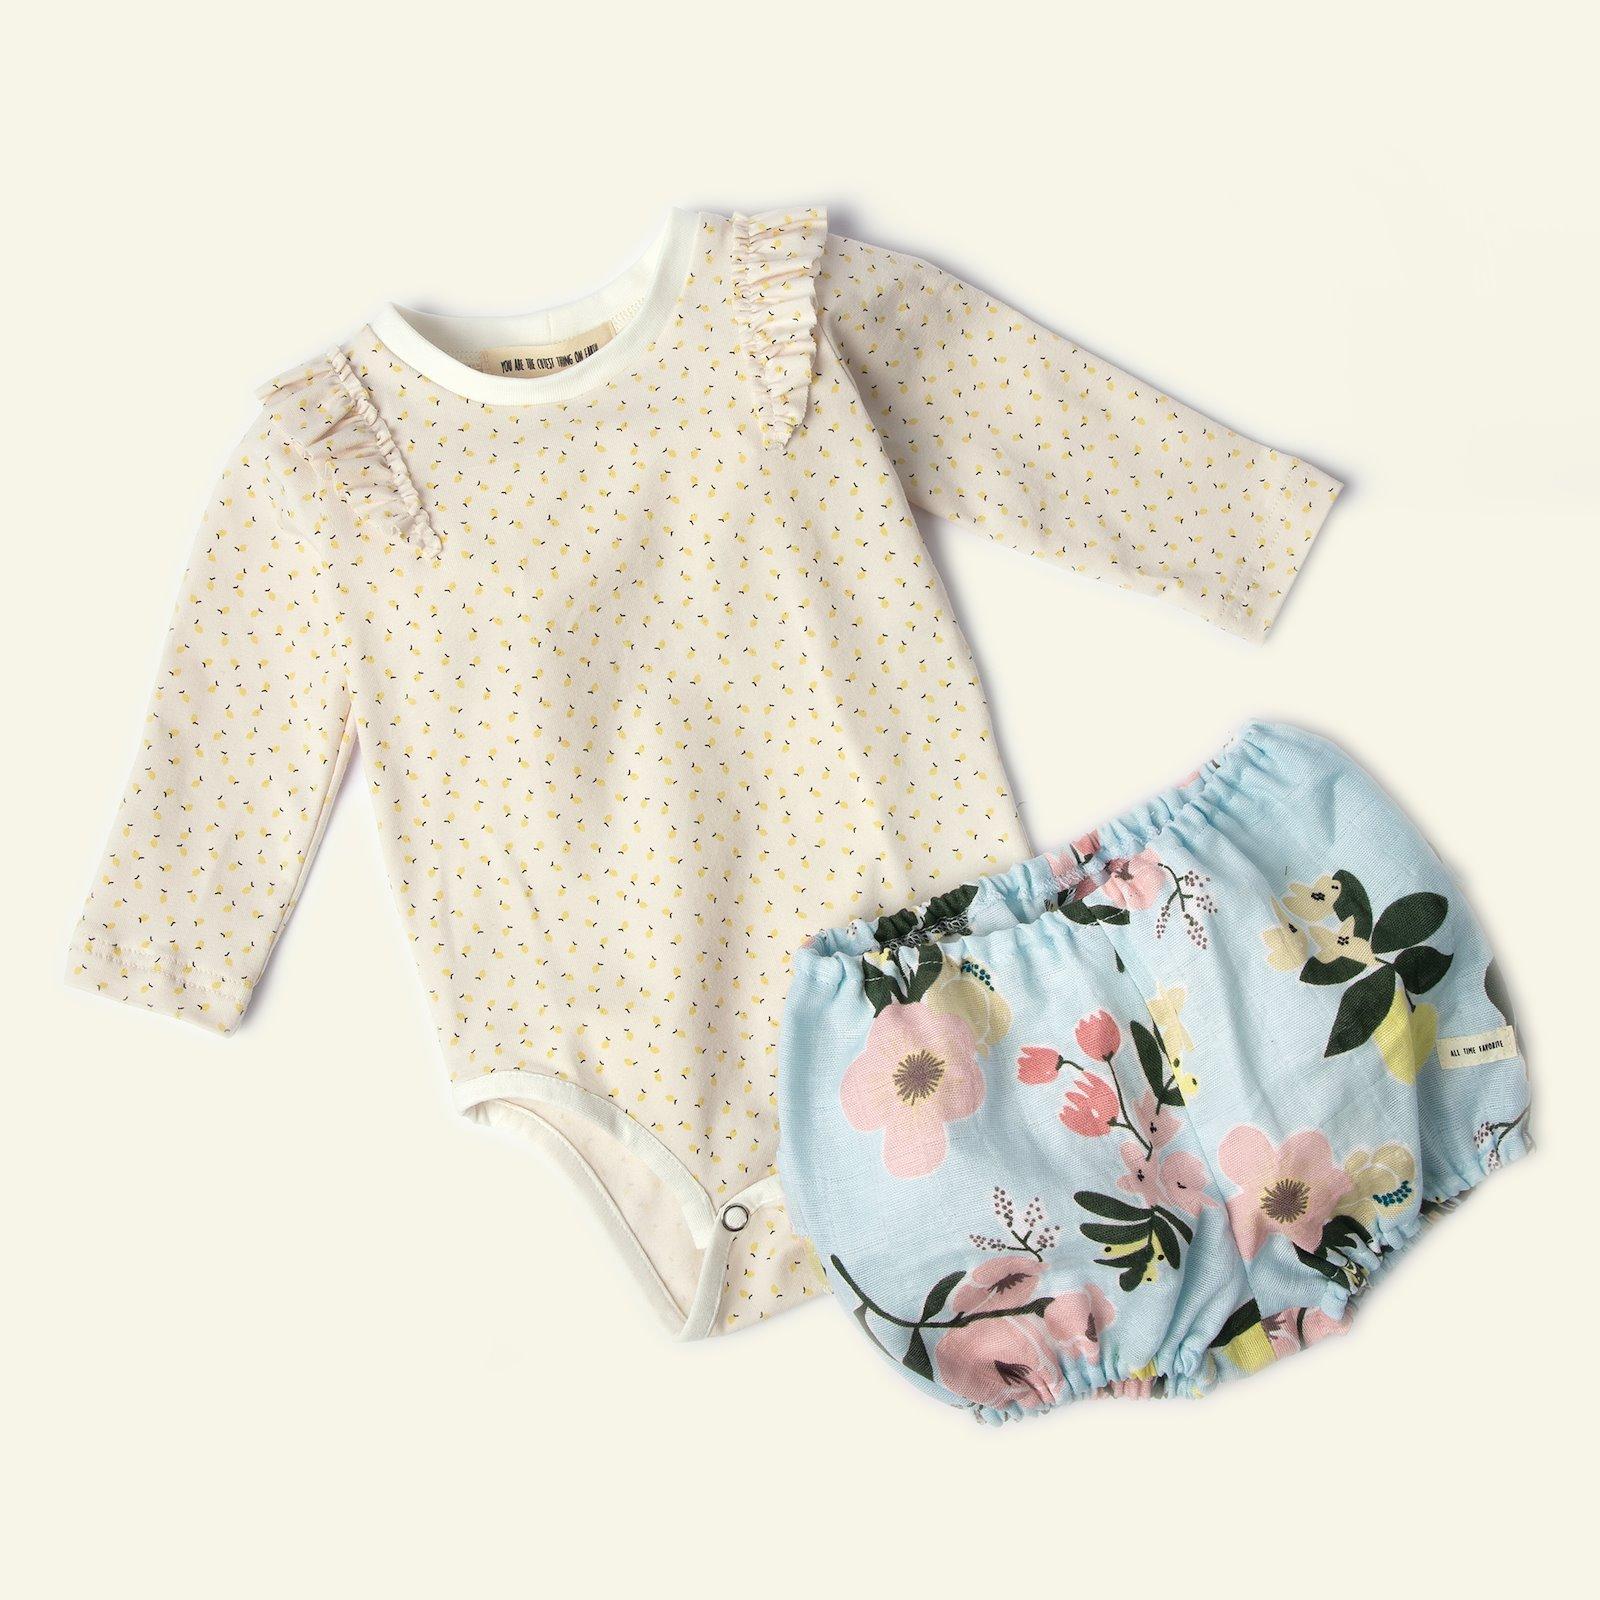 Bodysuit and skirt, 68/3m p81027_272682_230635_62002_p80005_501858_26552_bundle